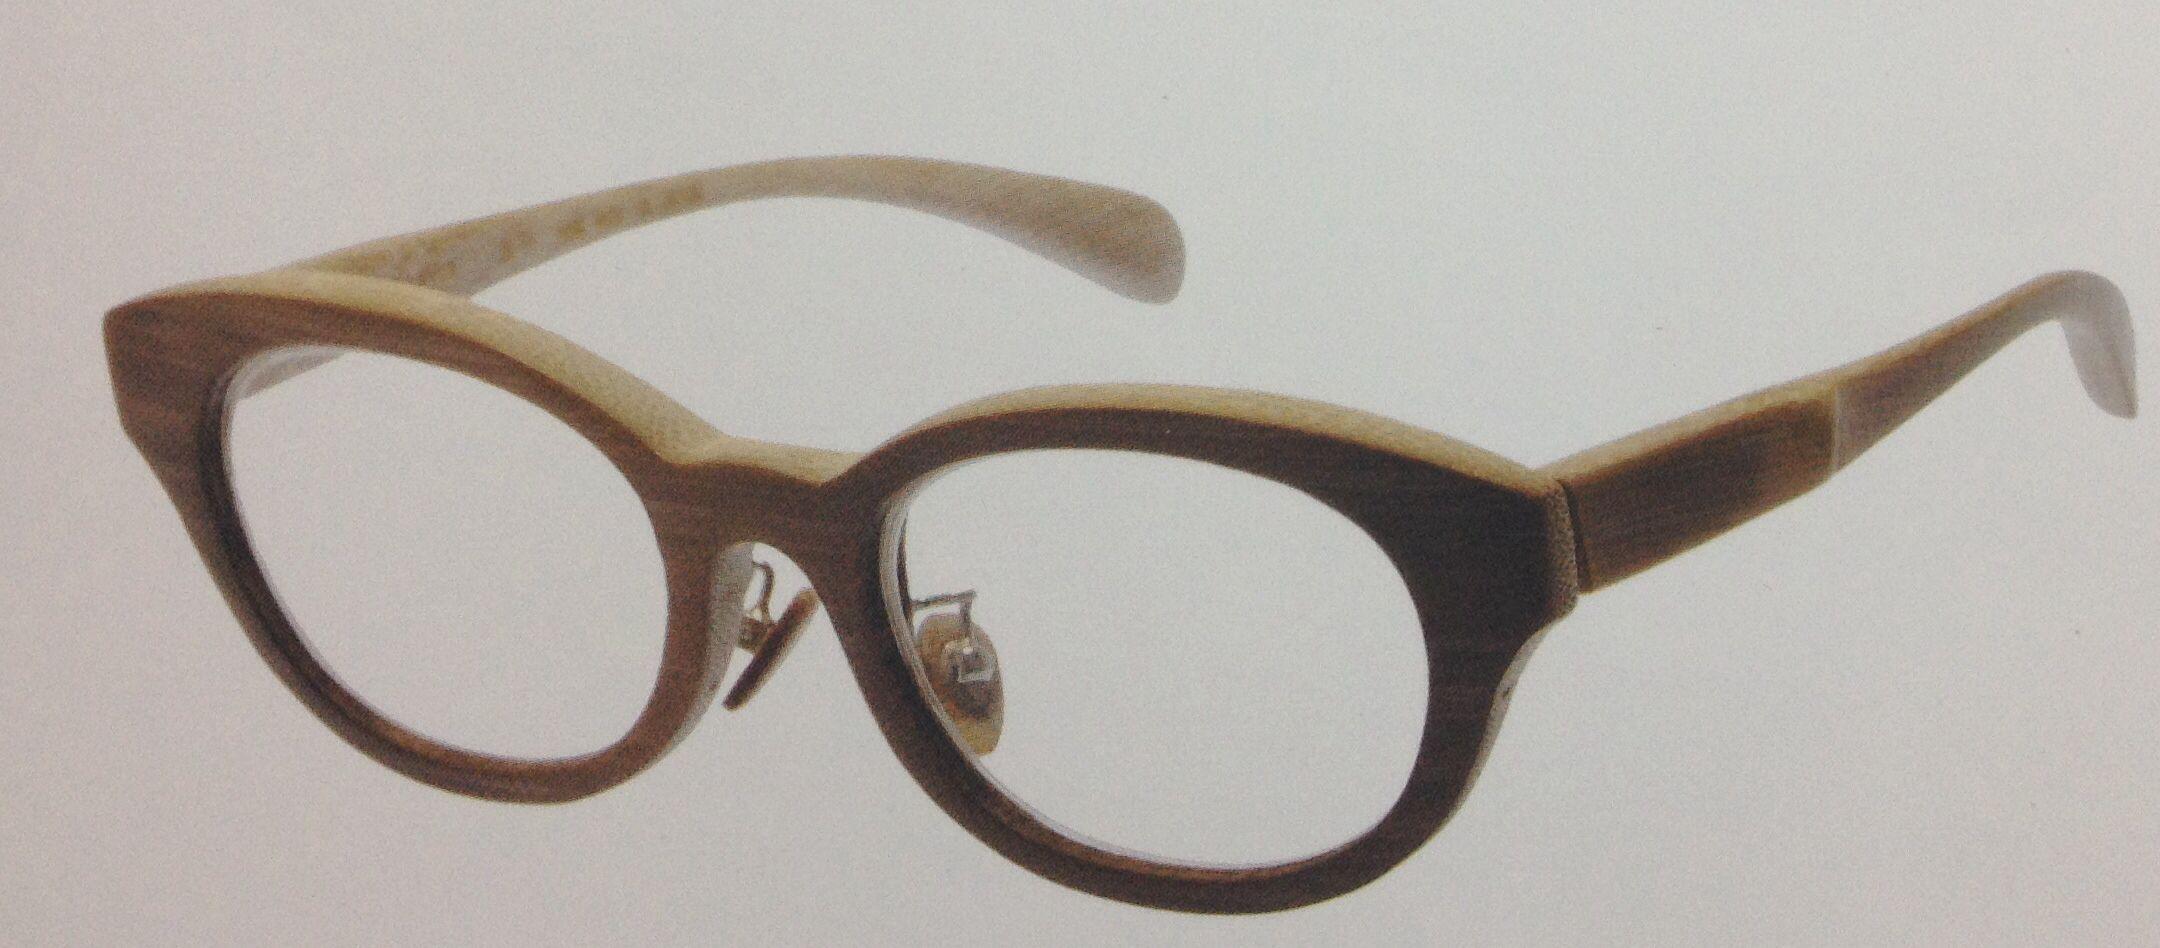 Eyeglass Frames From Japan : glasses from japan eyewear Pinterest